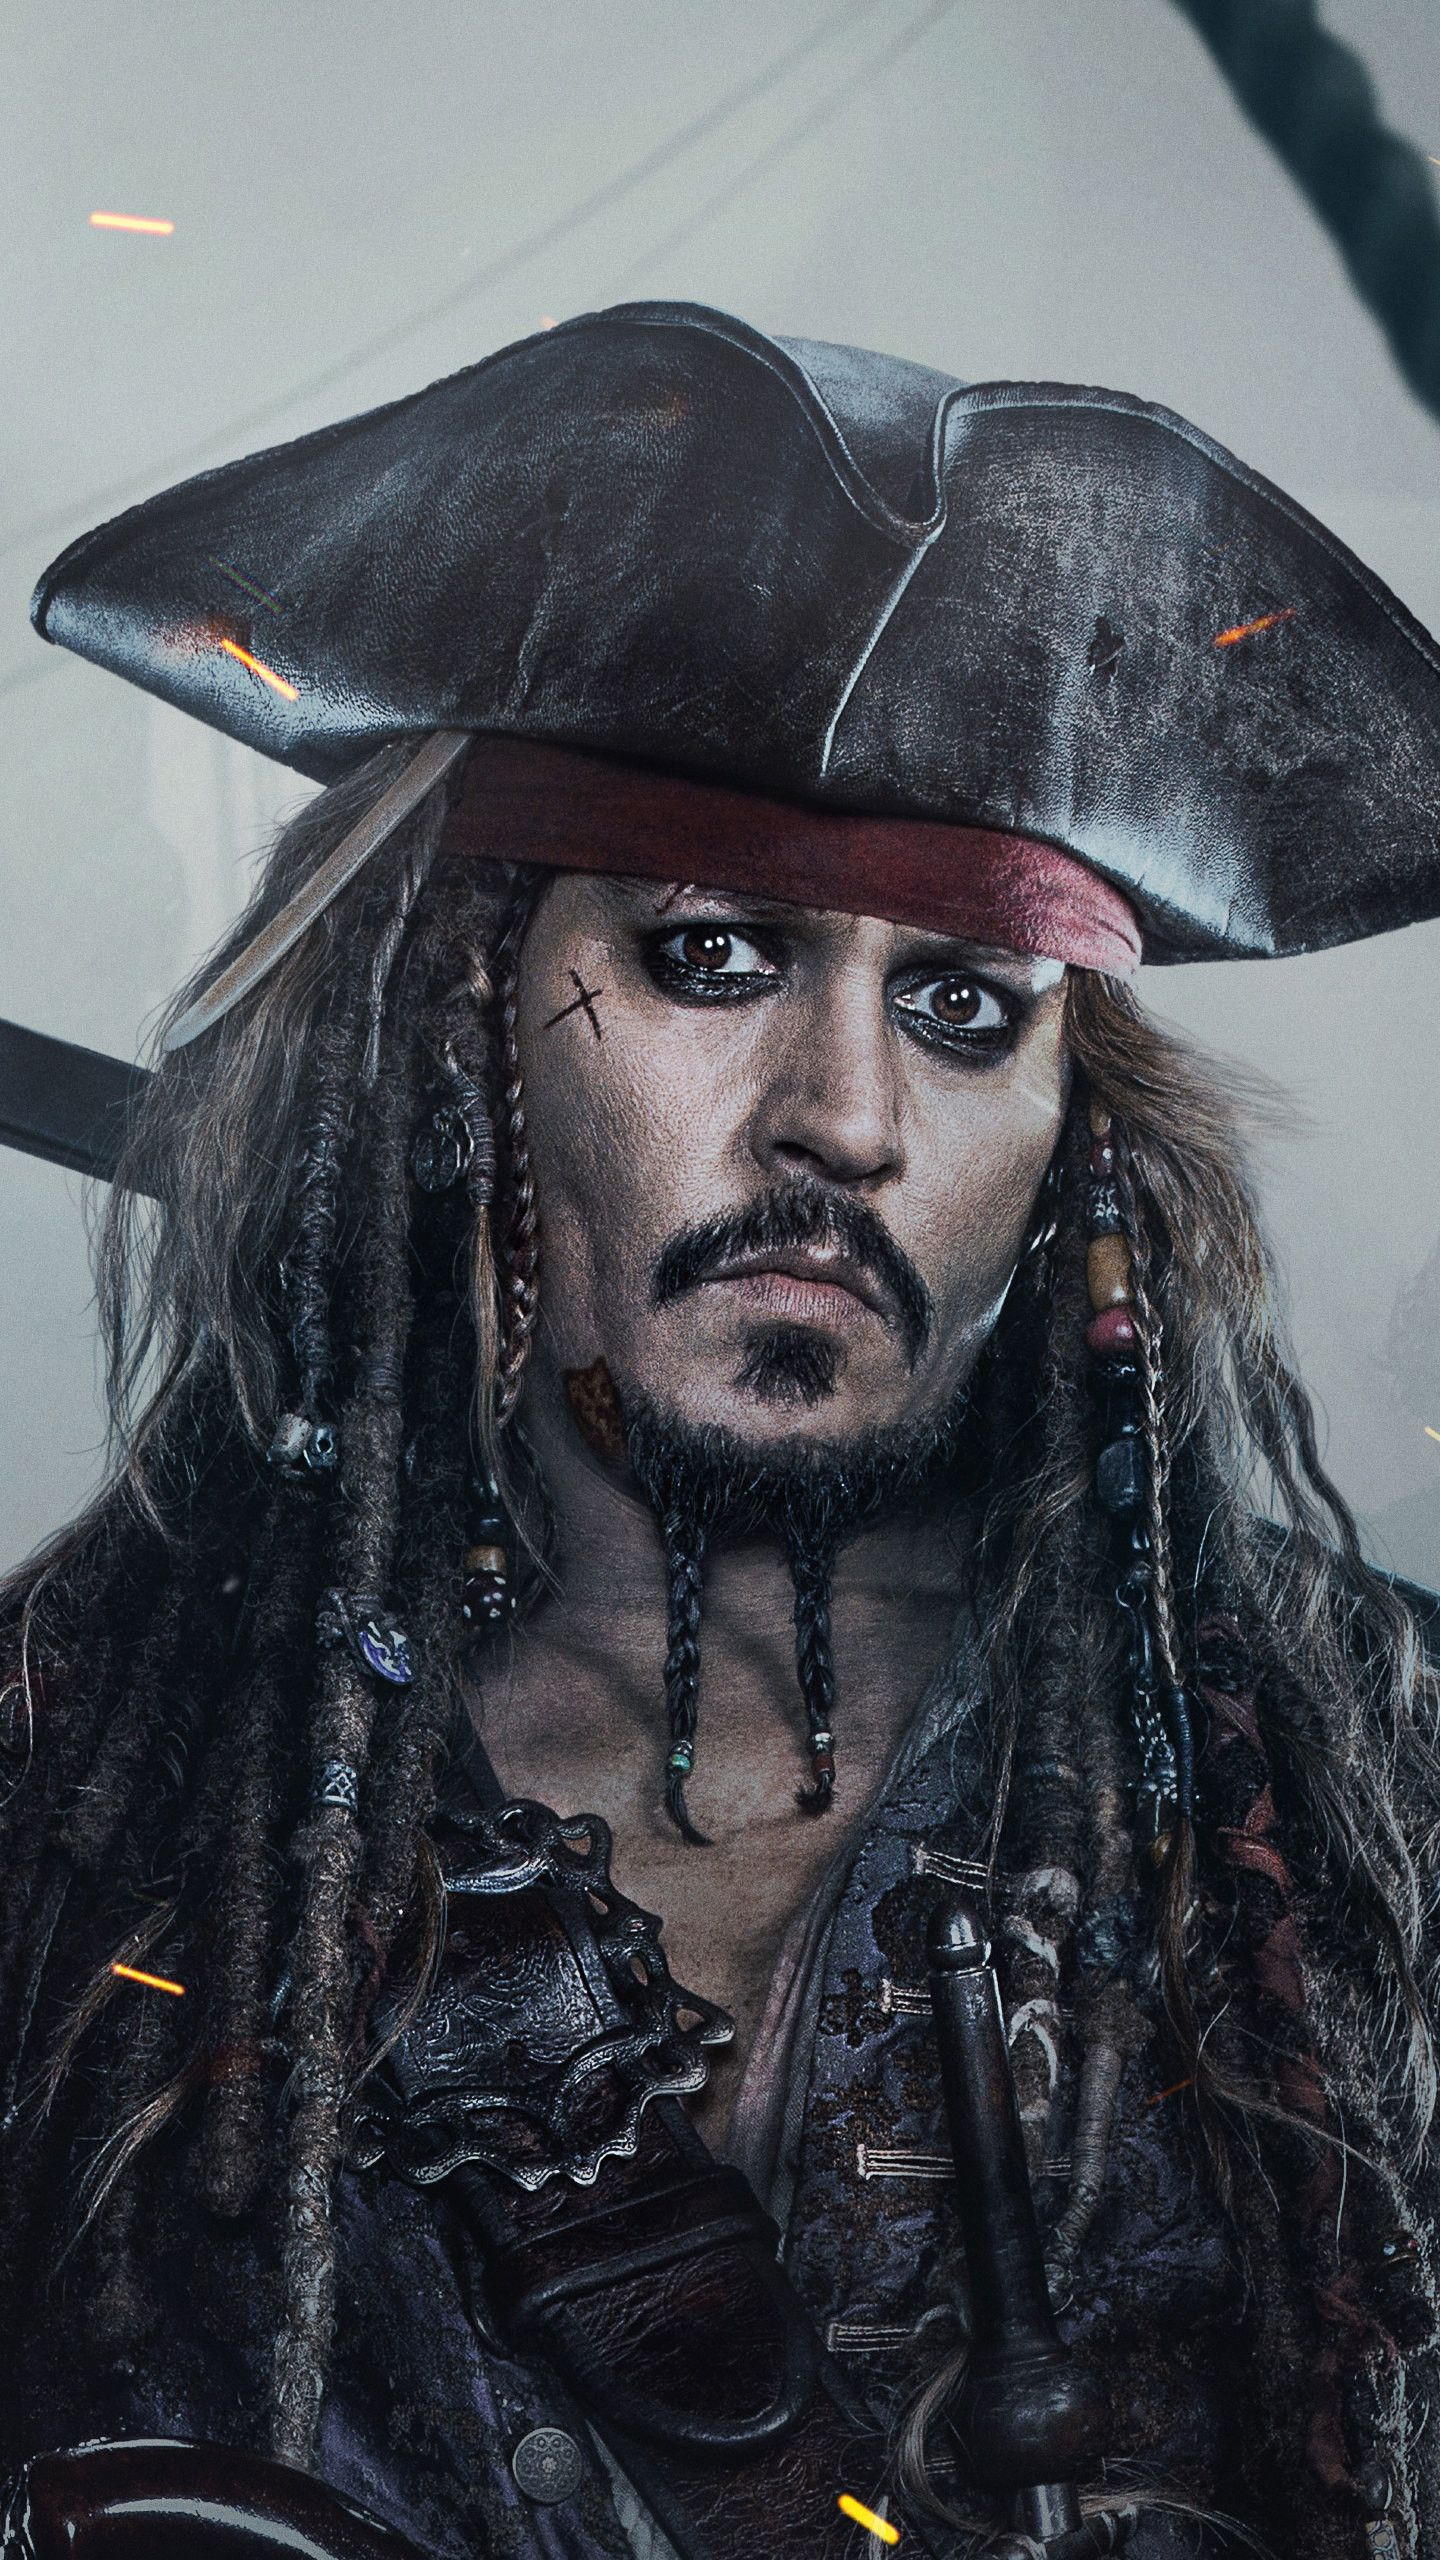 Qhd Samsung Galaxy S6 S7 Edge Note Lg G4 1440x2560 1440x2560 Jack Sparrow Wallpaper Jack Sparrow Captain Jack Sparrow